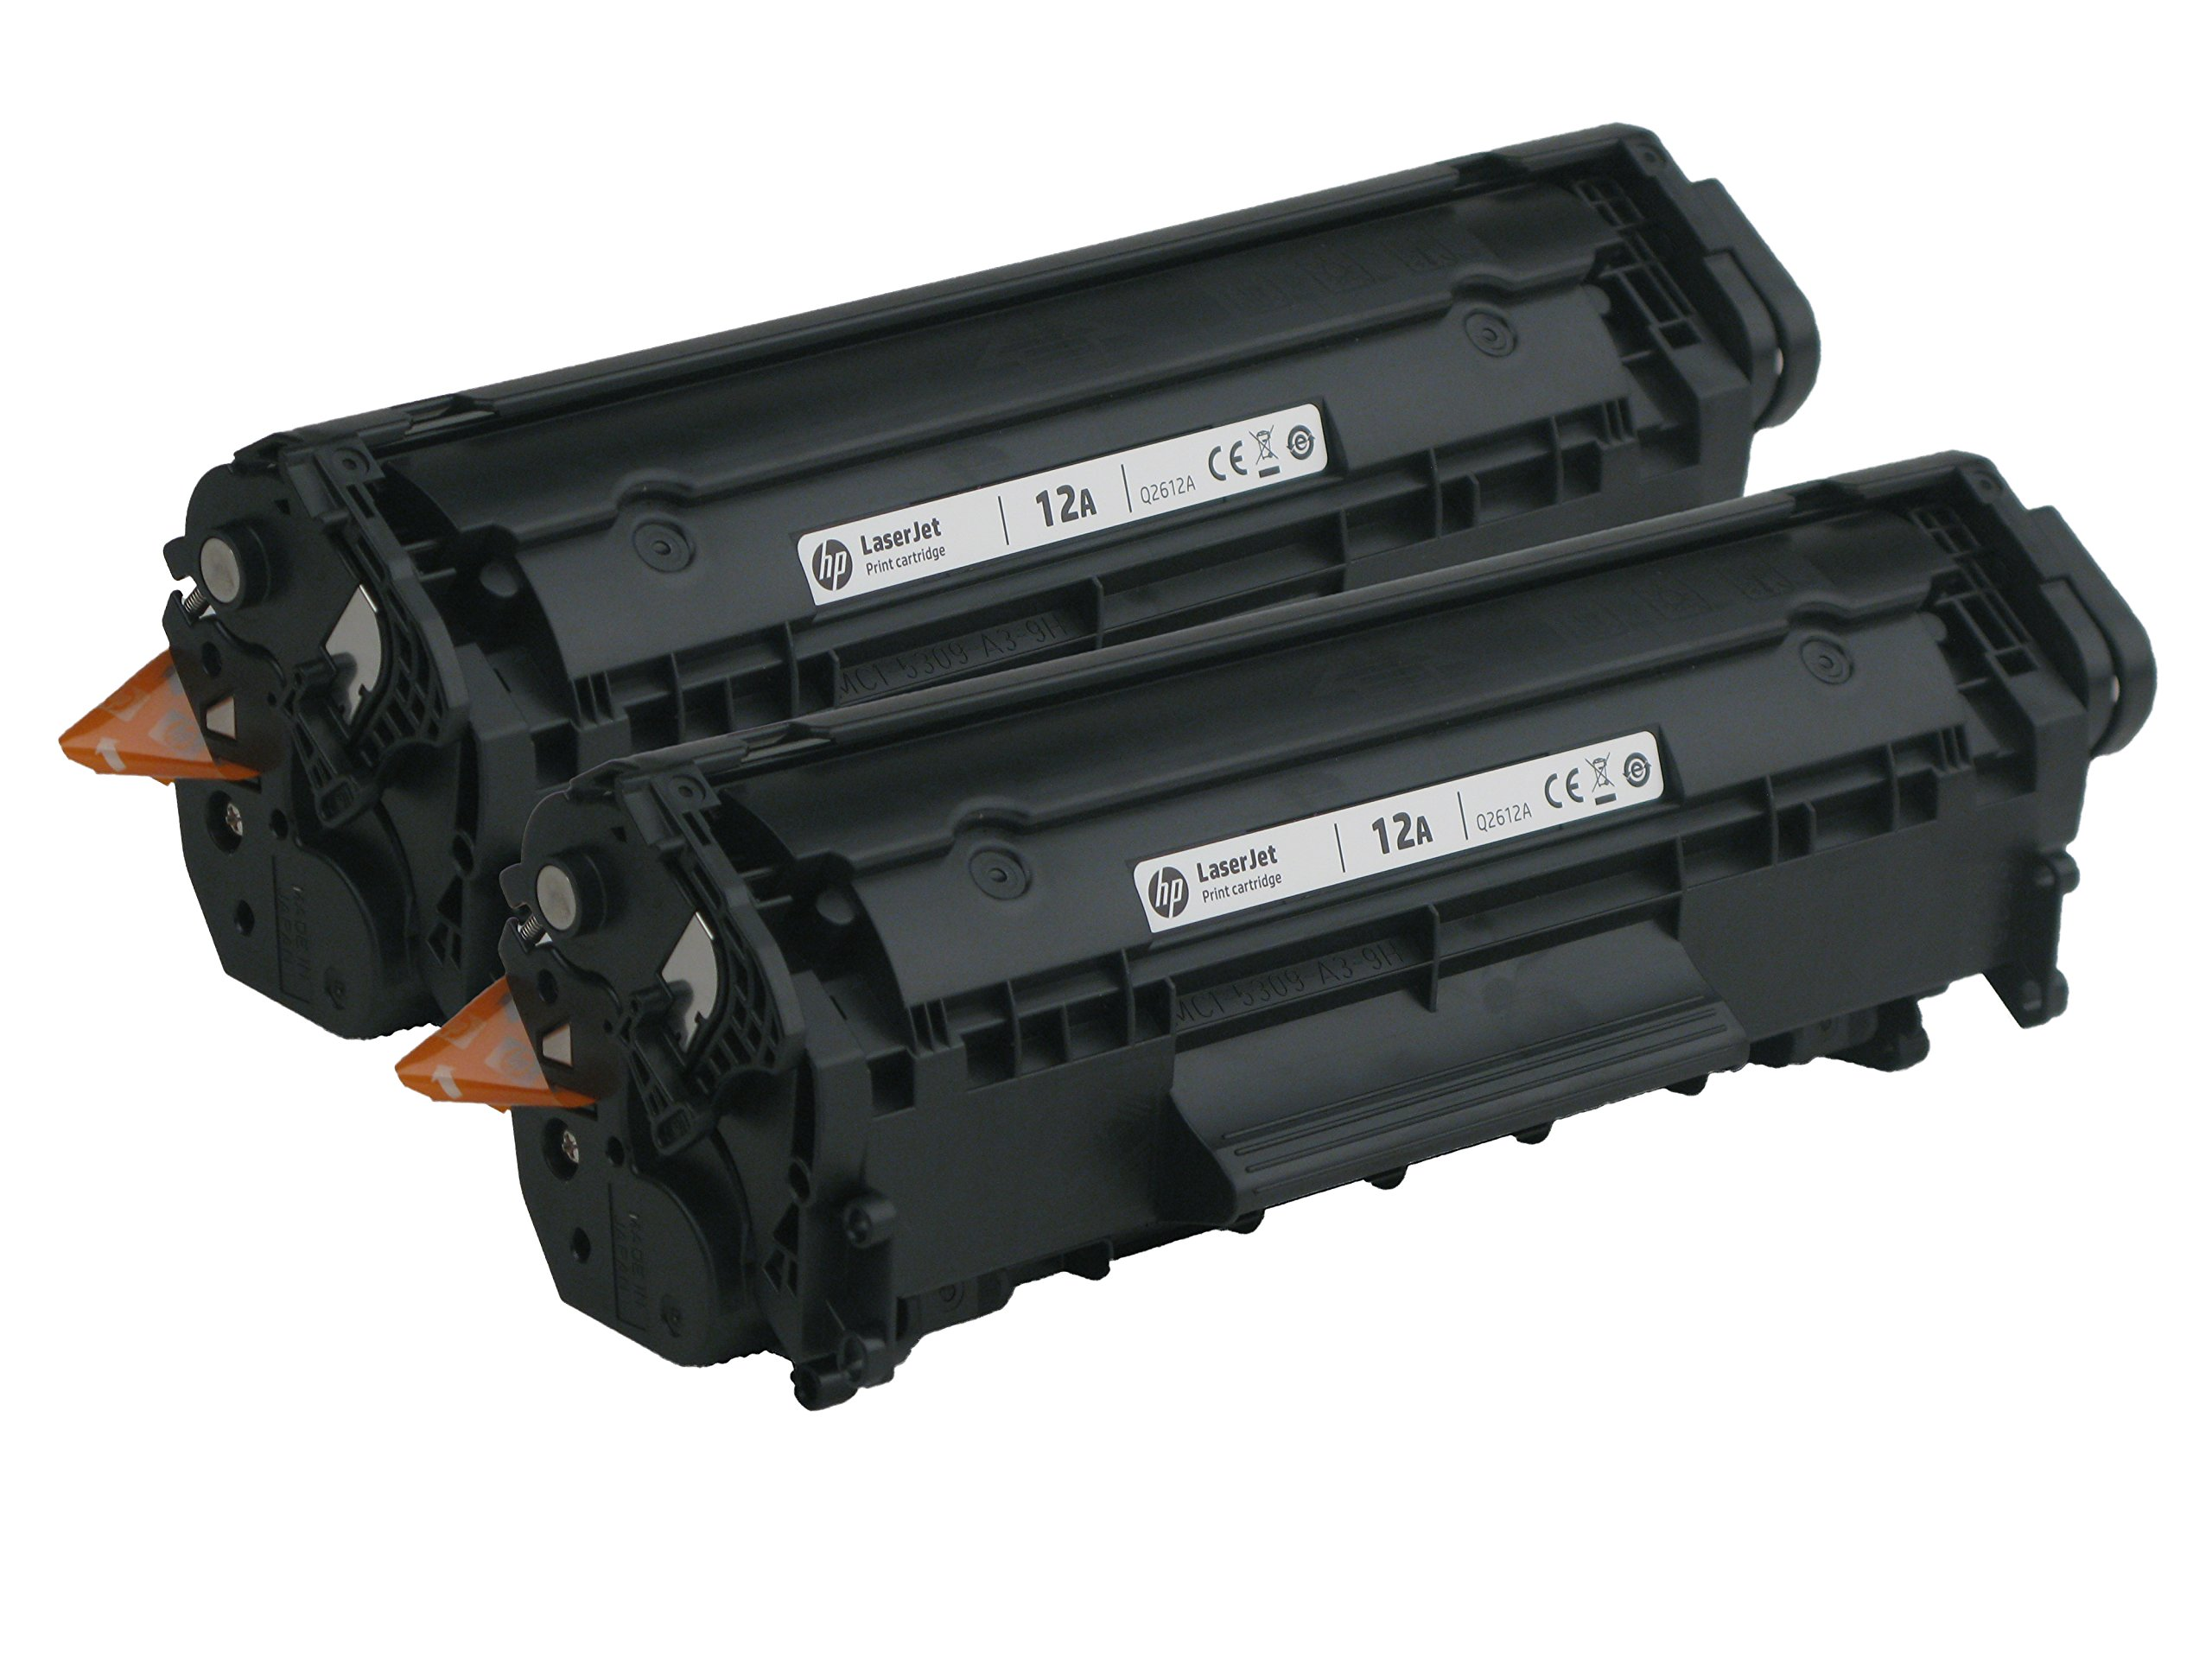 10pk Q2612X 12X High Yield Toner Cartridge Fits HP Laserjet All-in-One 3052 3055